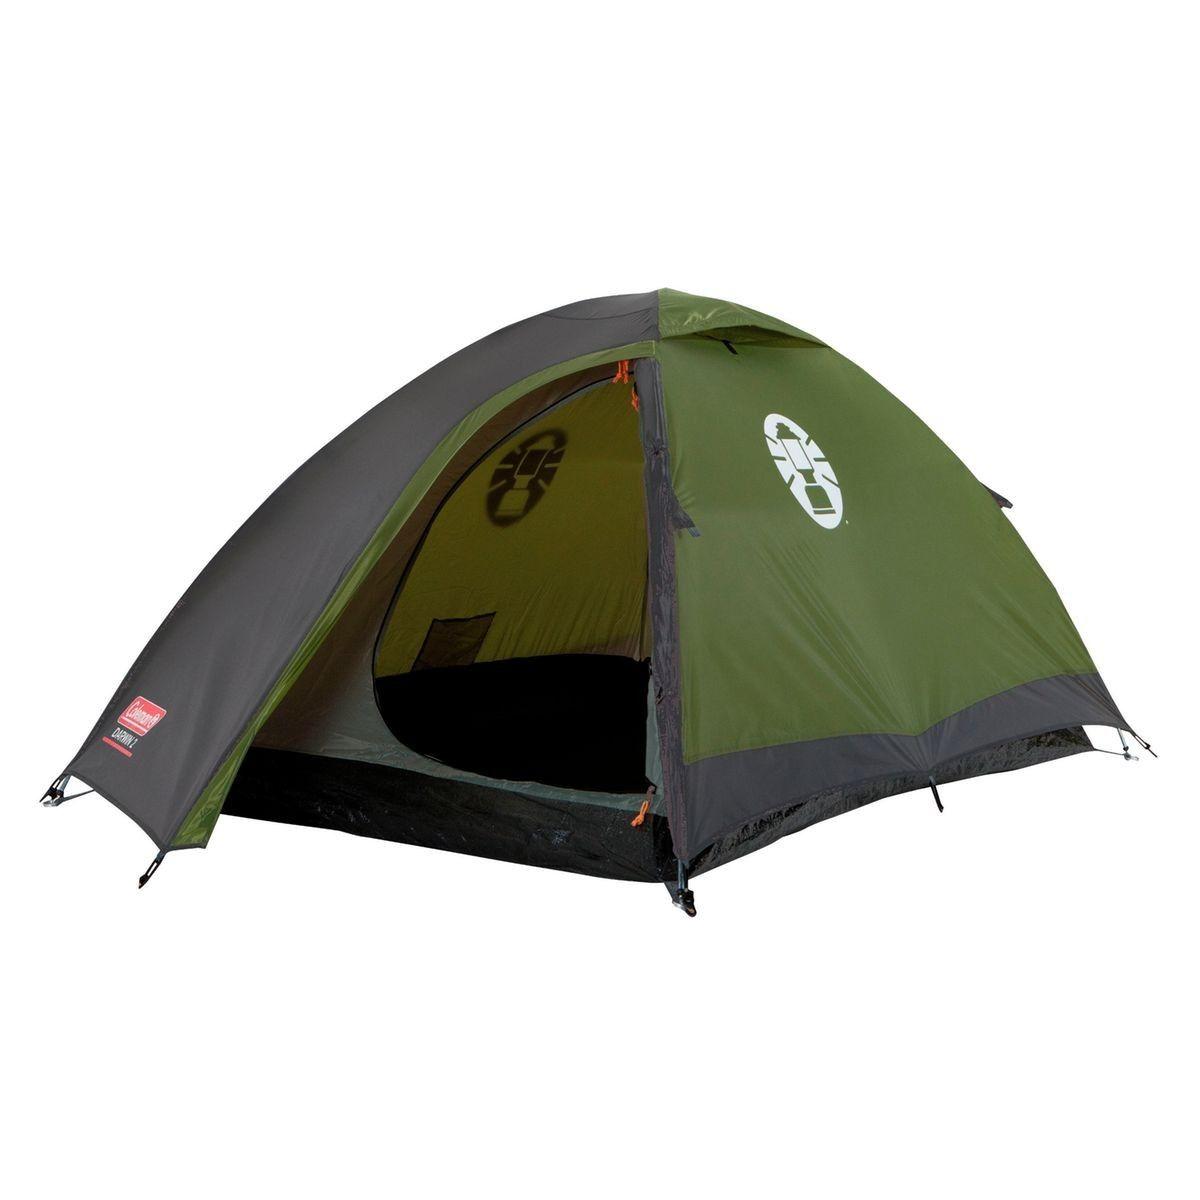 Darwin 2 Tente Vert Taille 2 Places Tente Verte Tente Dome Et Tentes Interieures